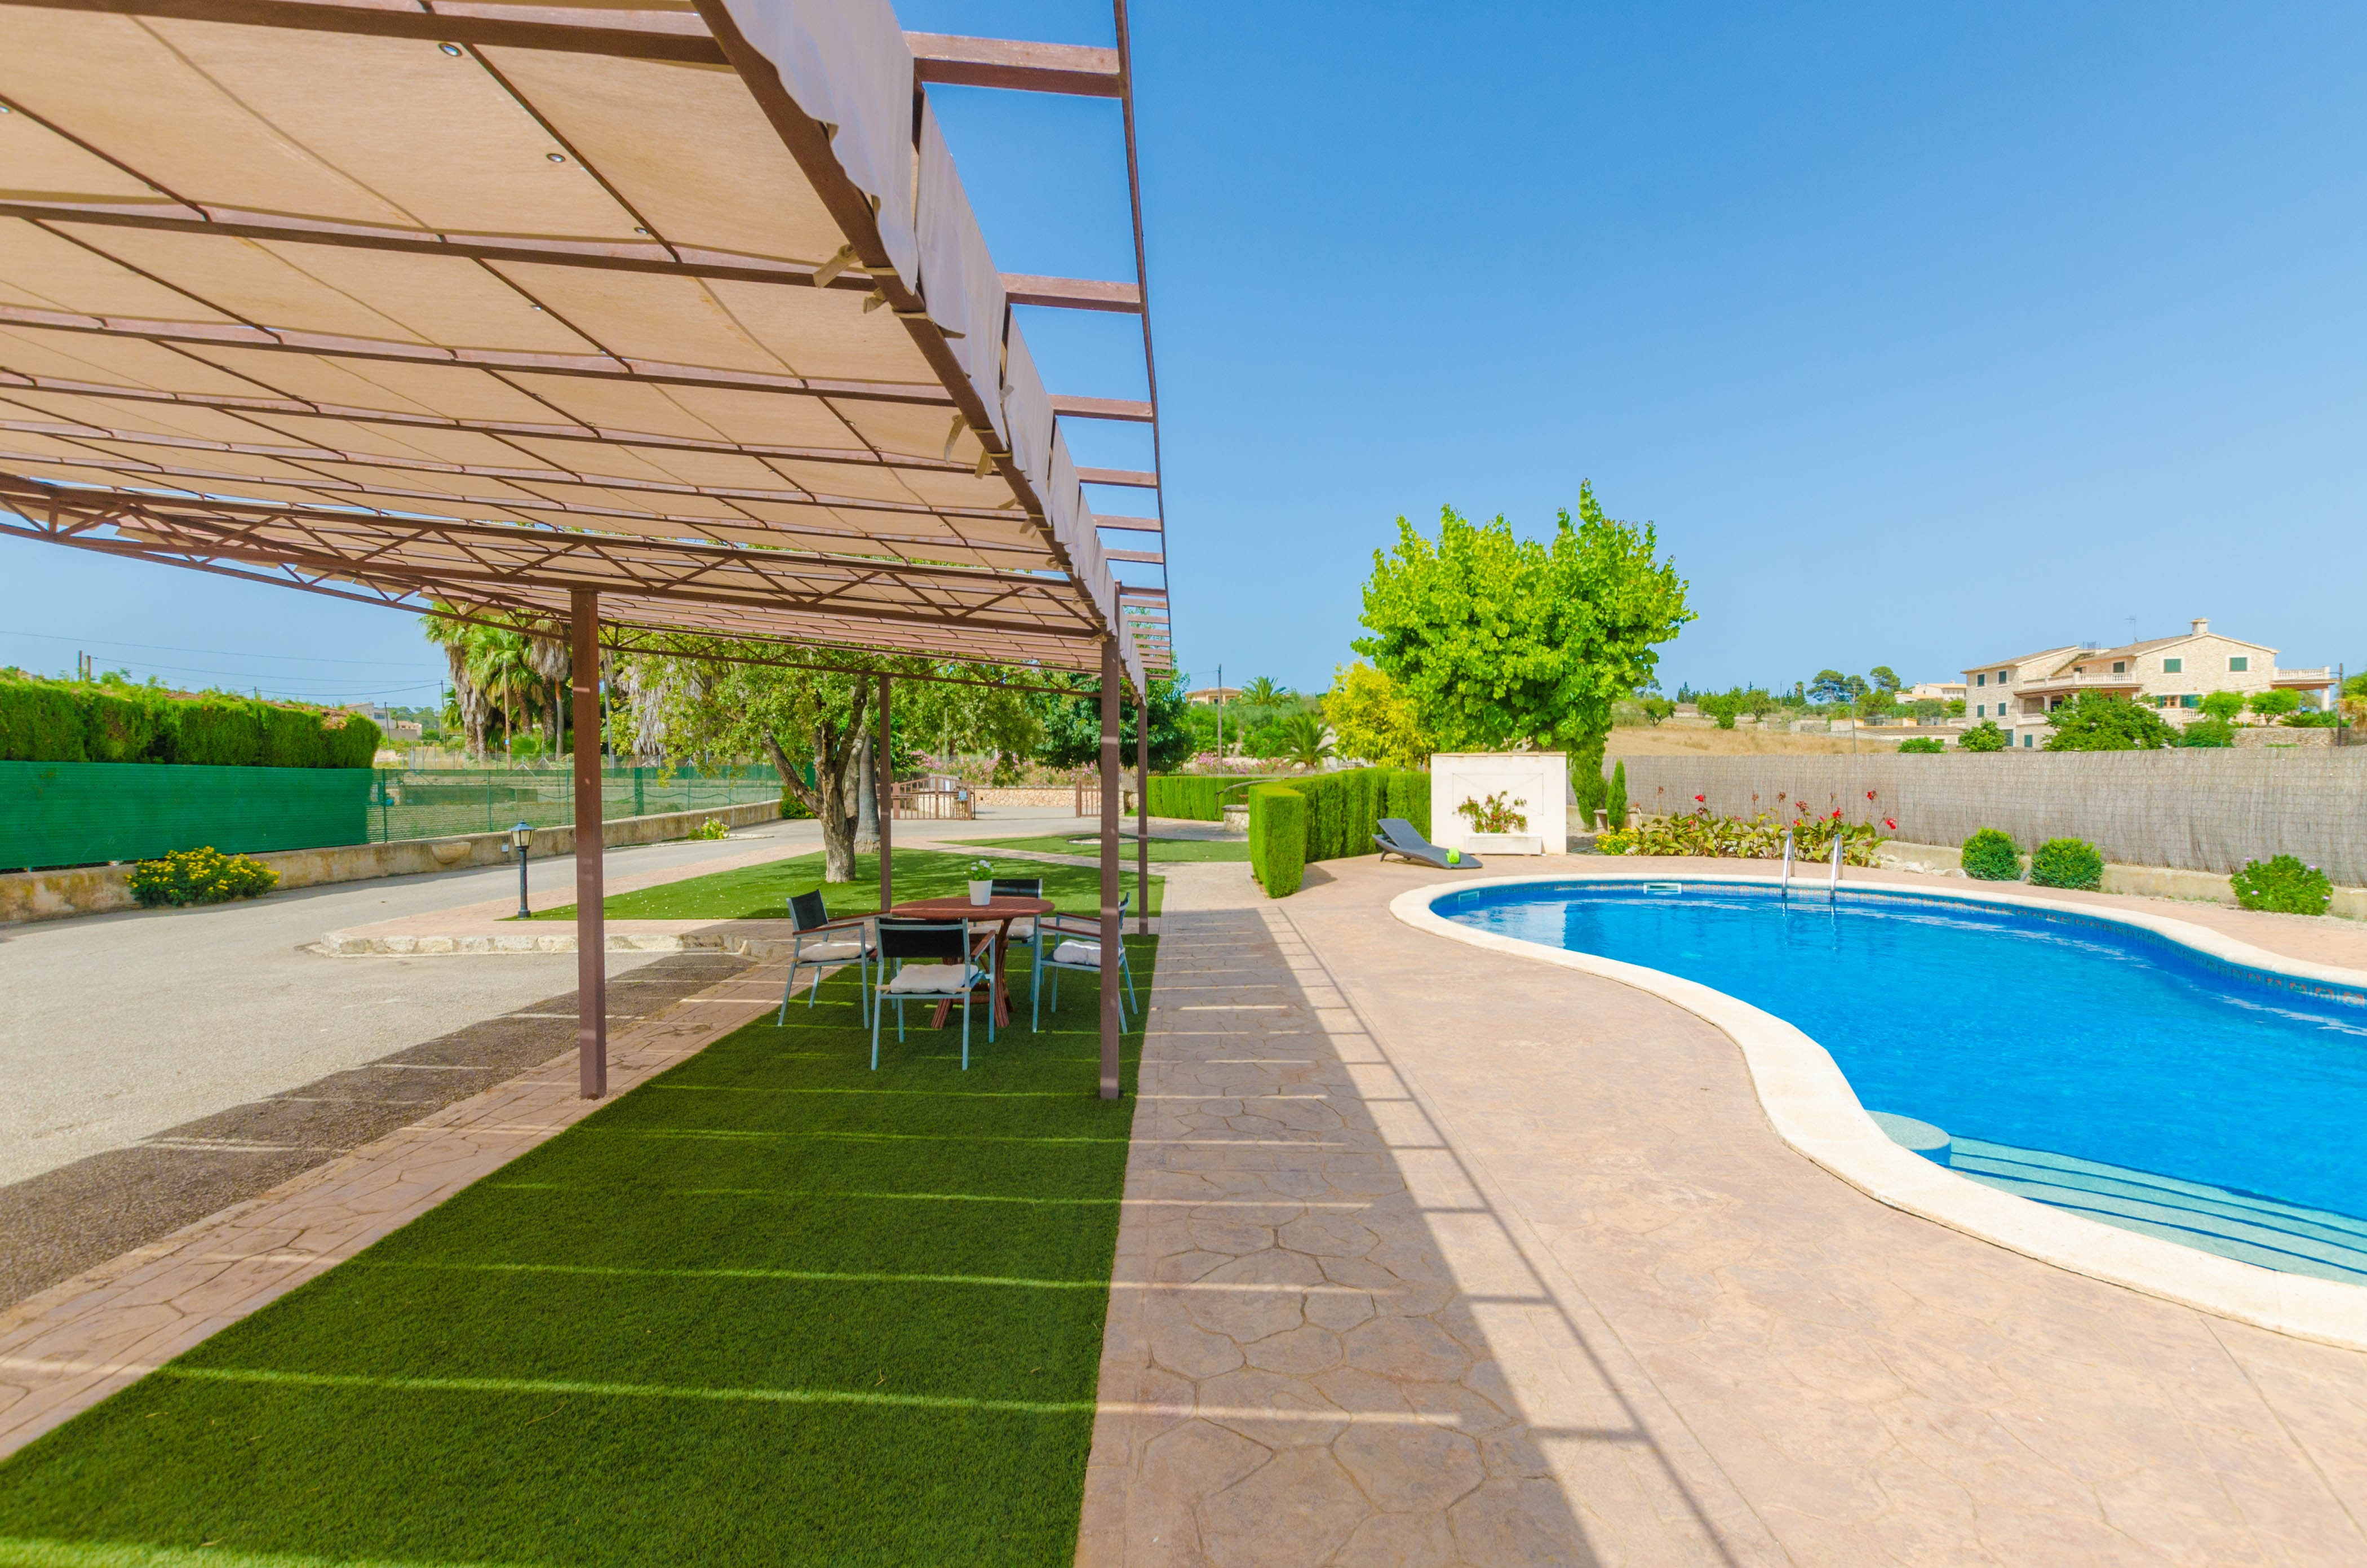 Maison de vacances SA SINIA (2374876), Lloret de Vistalegre, Majorque, Iles Baléares, Espagne, image 46